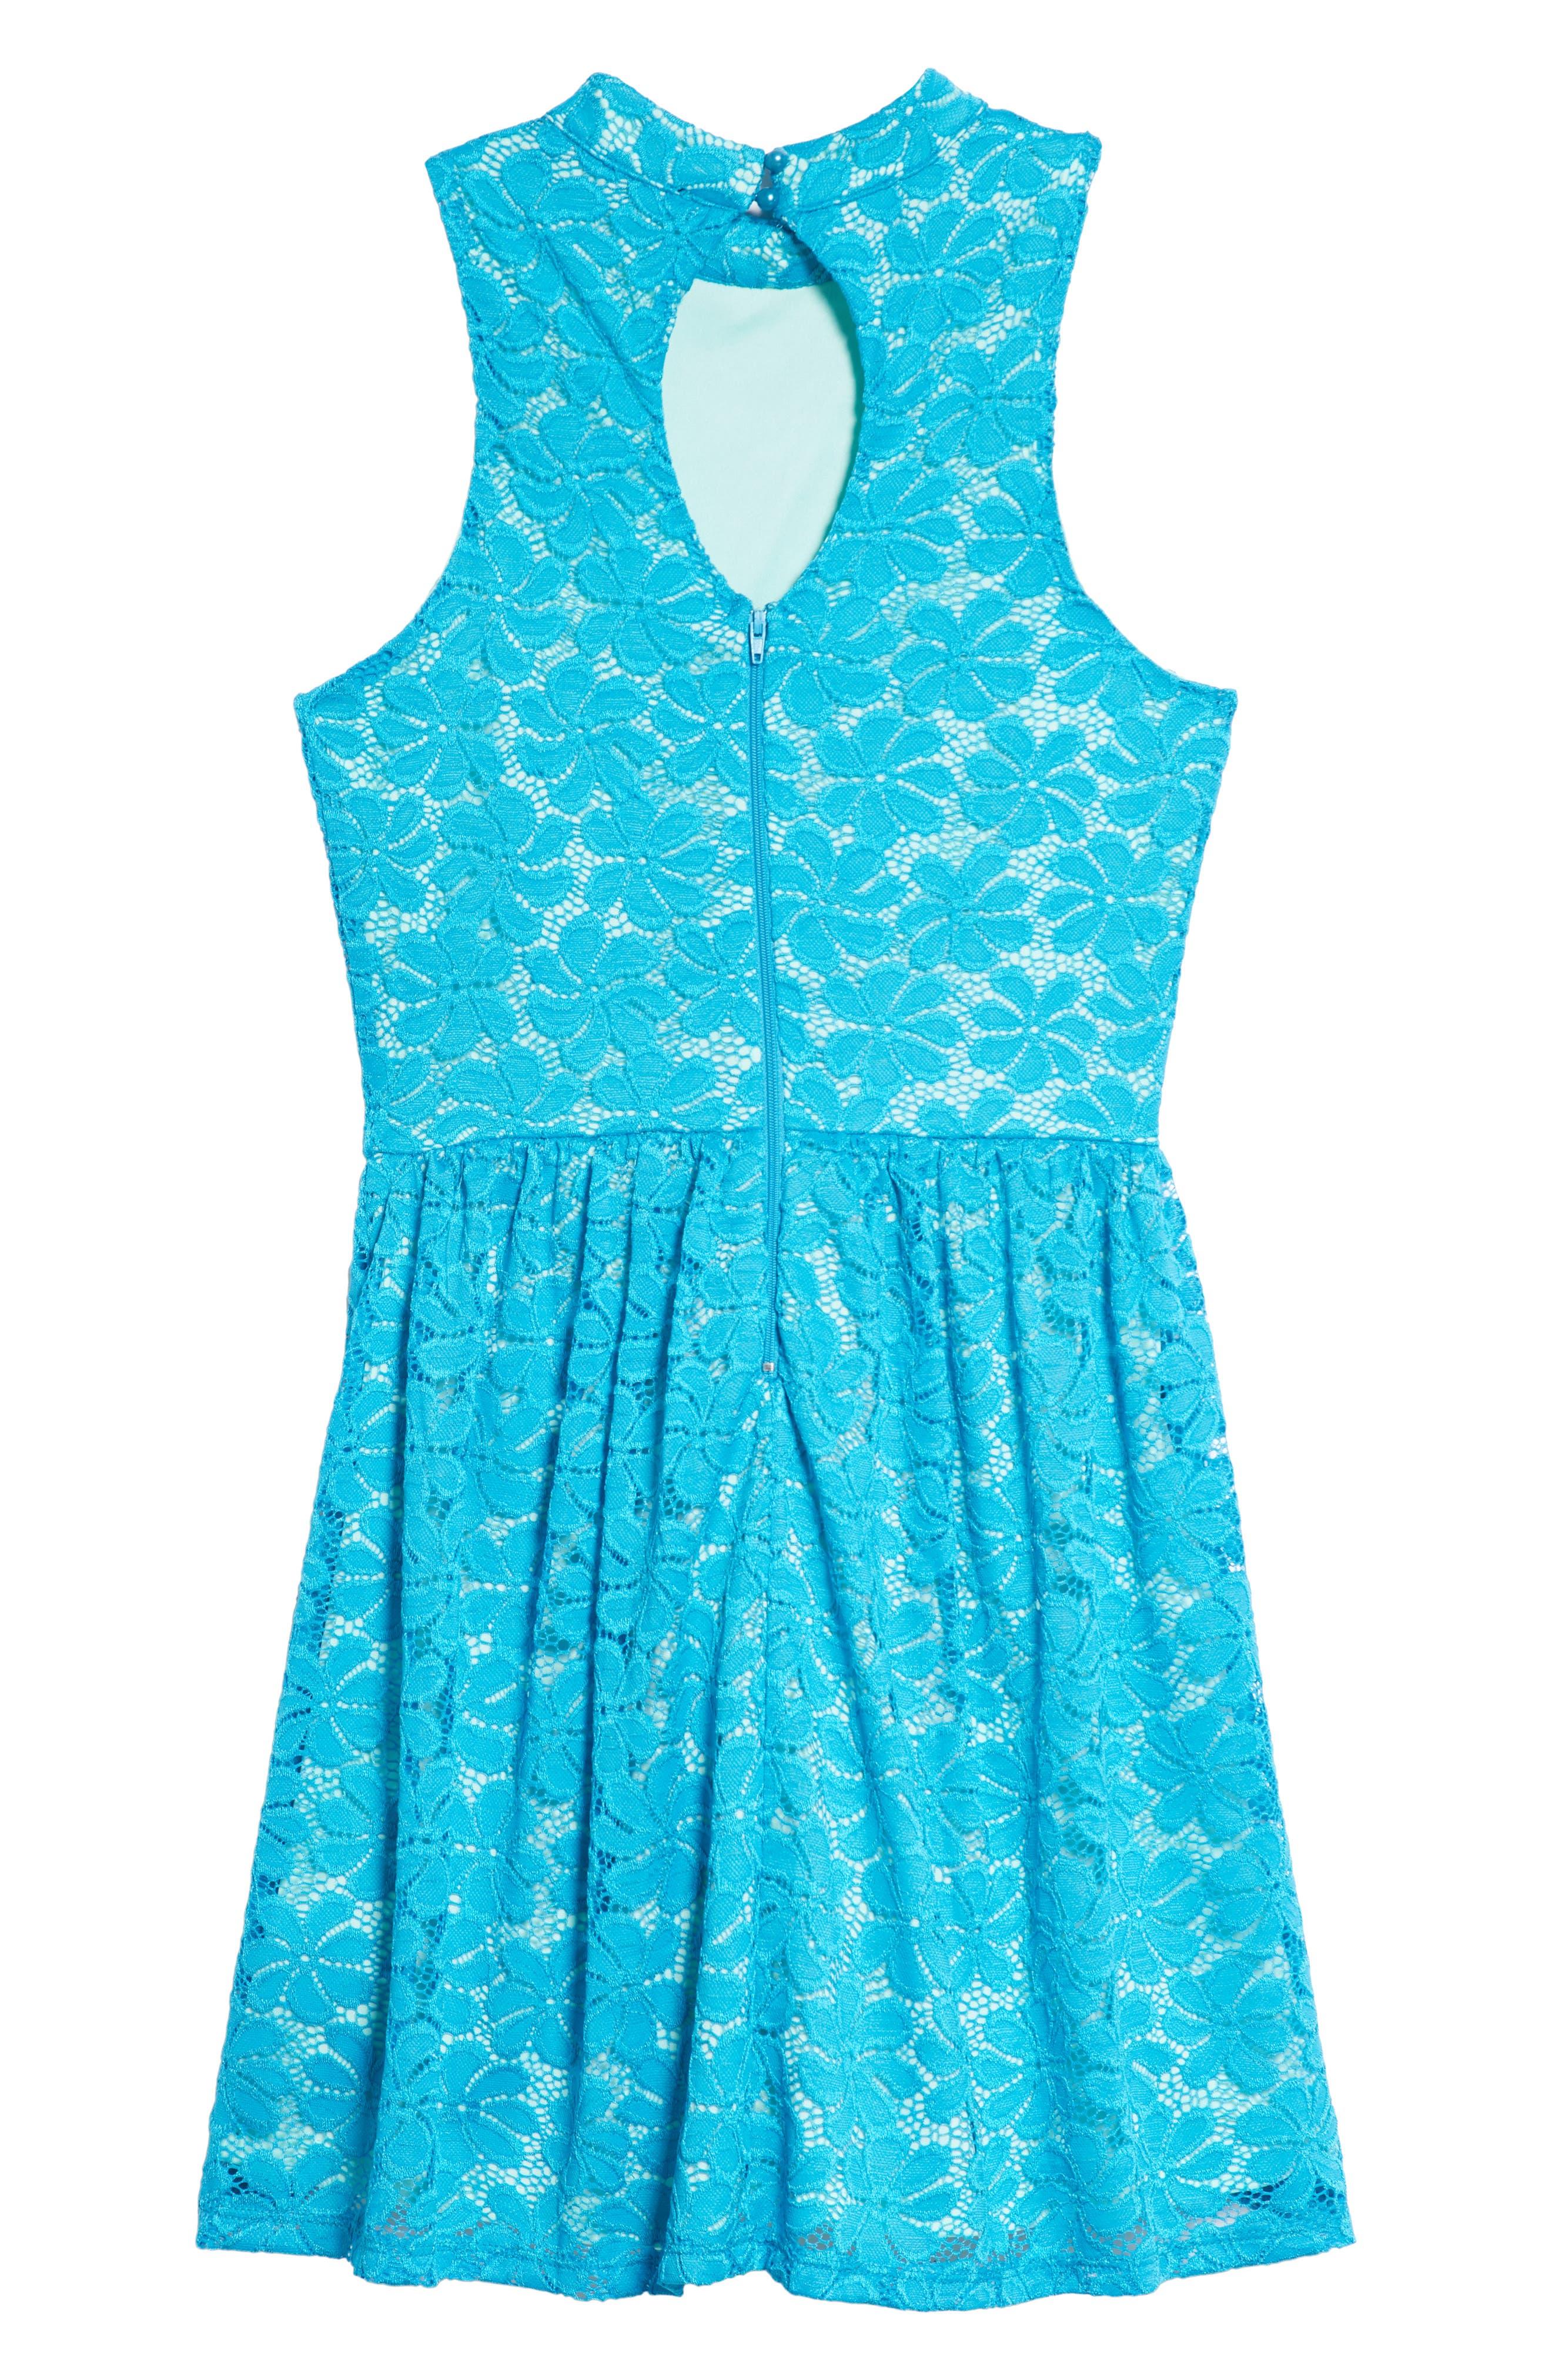 Hailee Lace Dress,                             Alternate thumbnail 2, color,                             400